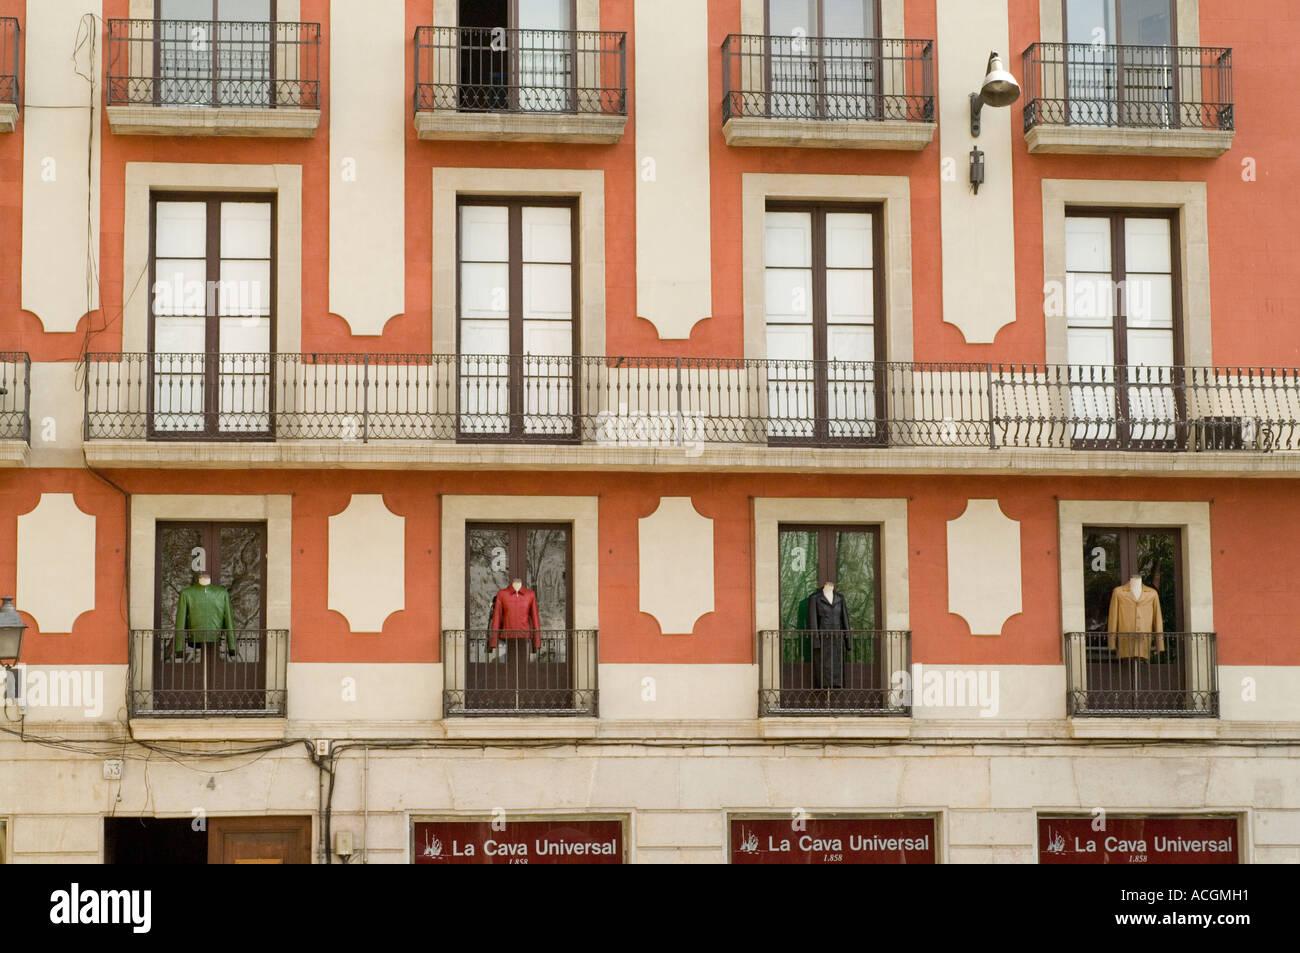 La Cava Universal, Ciutat Vella, Barcelona Spain - Stock Image